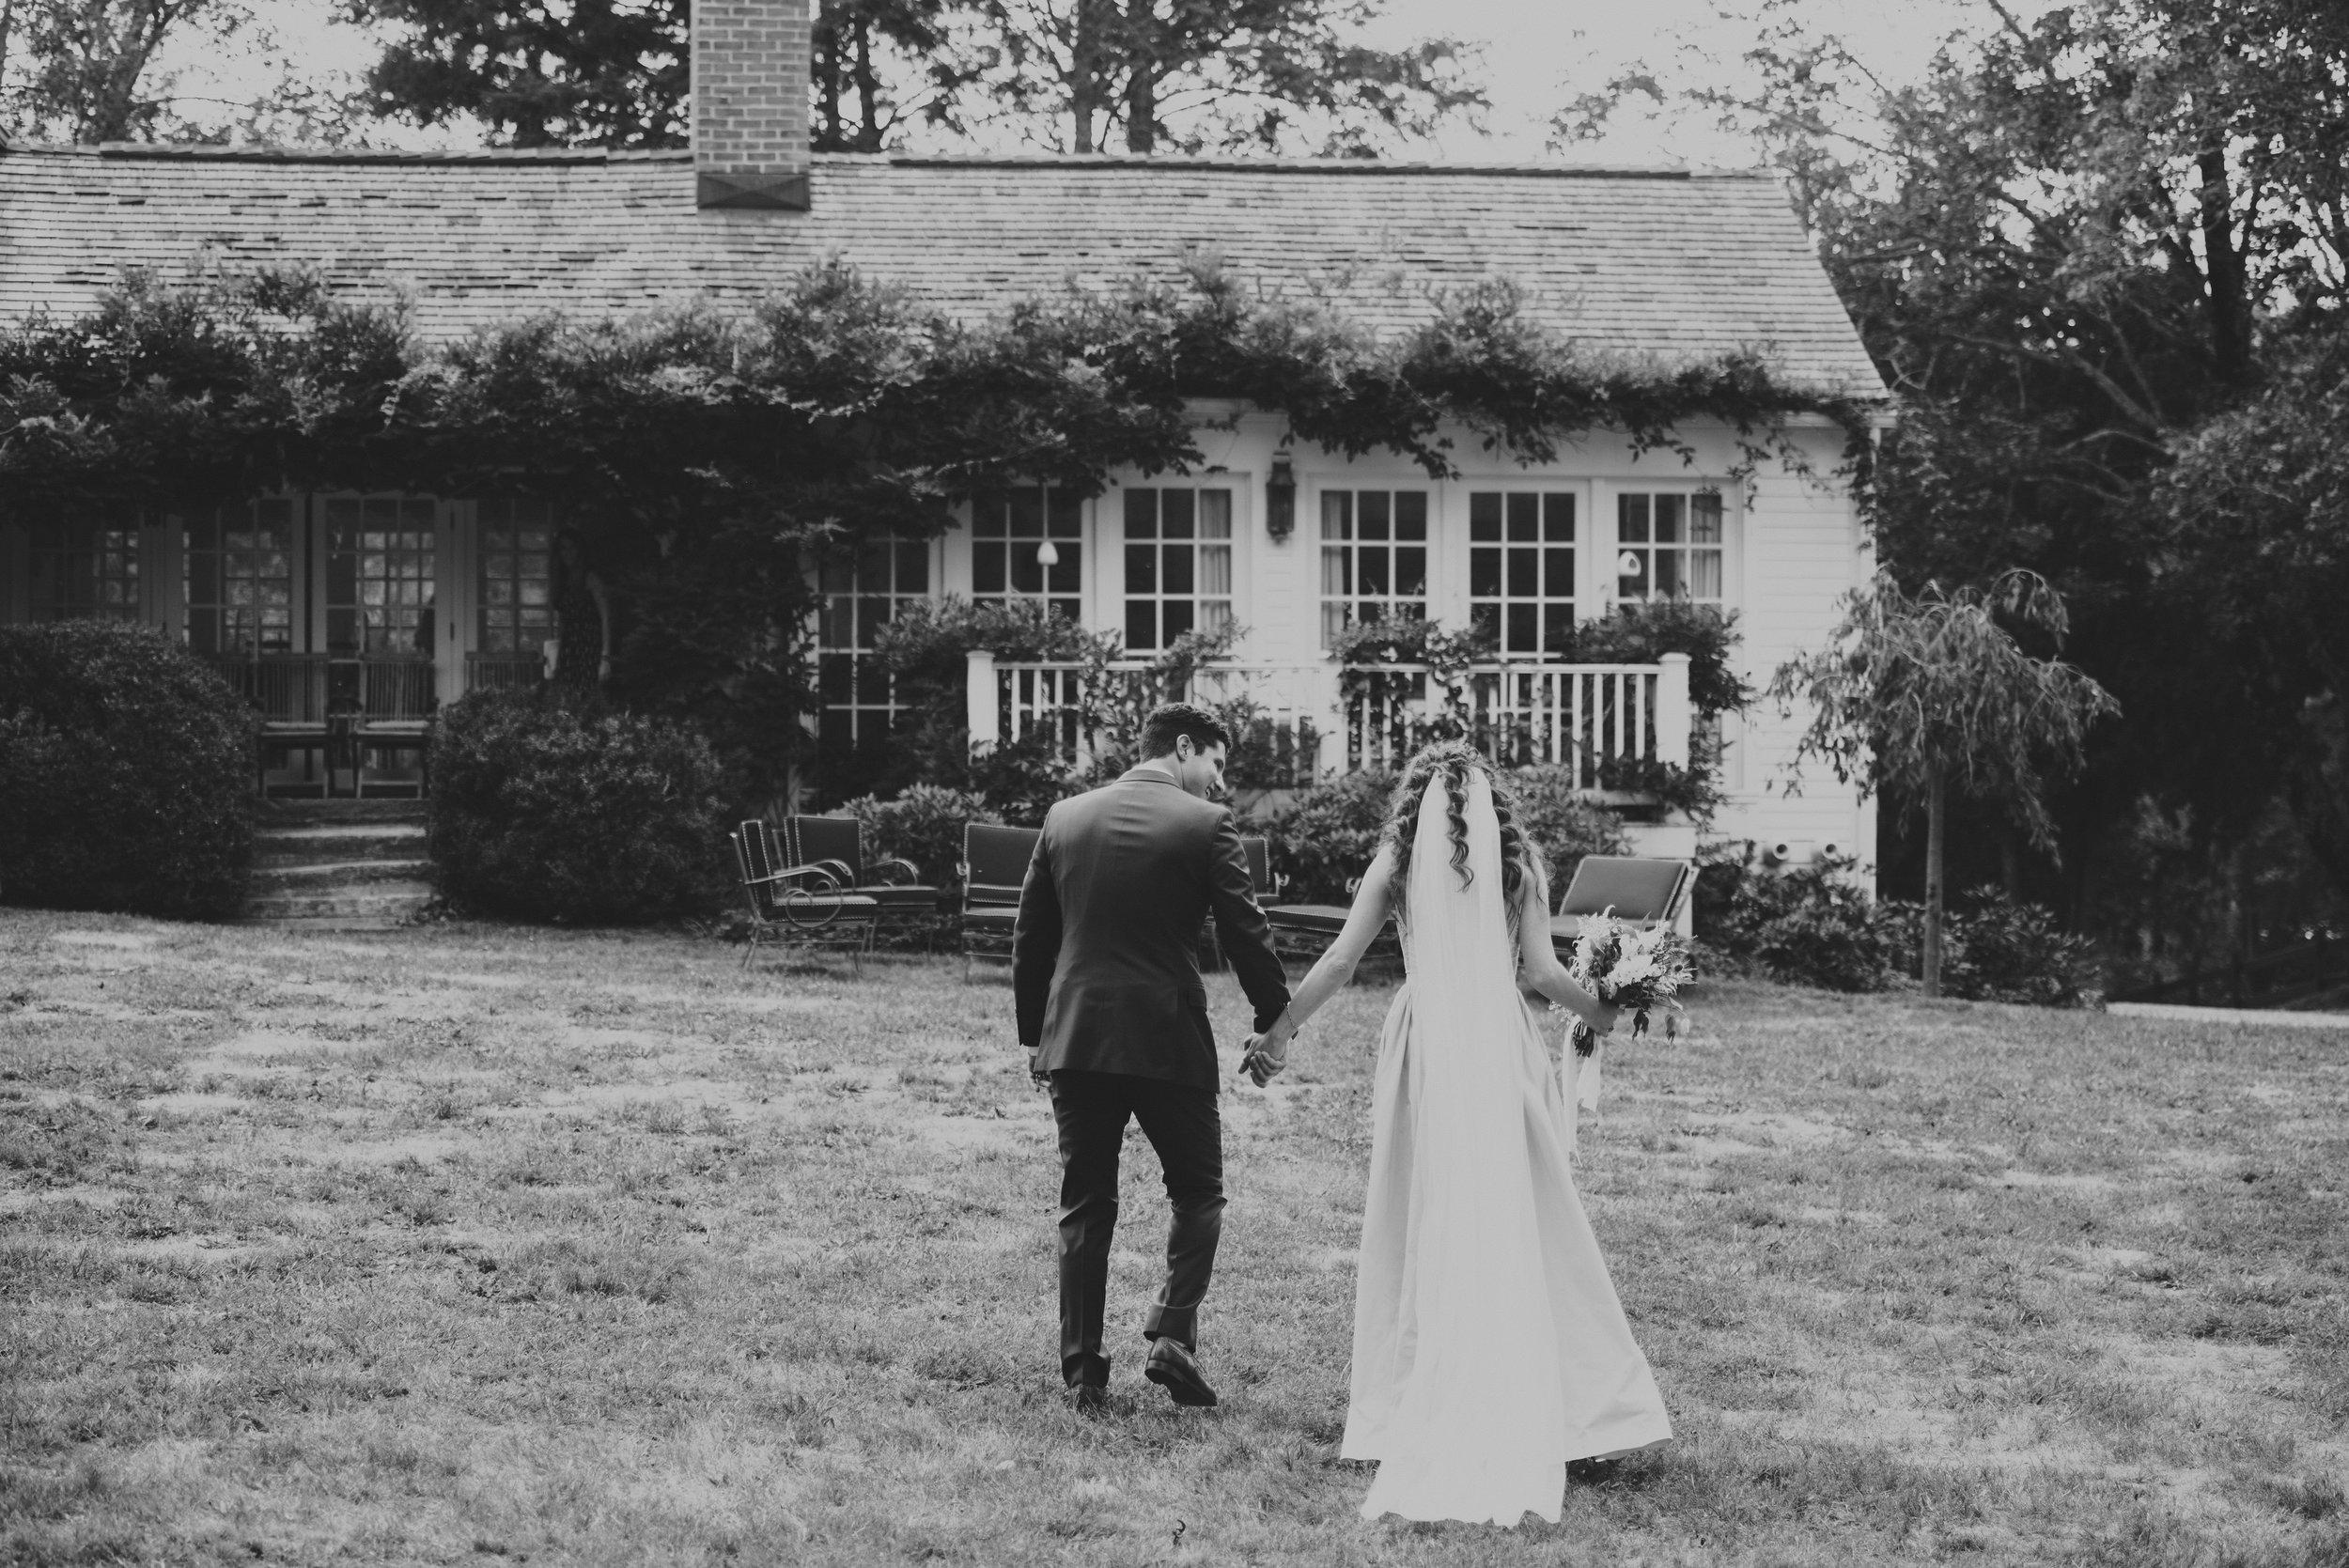 COPPER GEOMETRIC WEDDING LACE FACTORY WEDDING_024.jpg